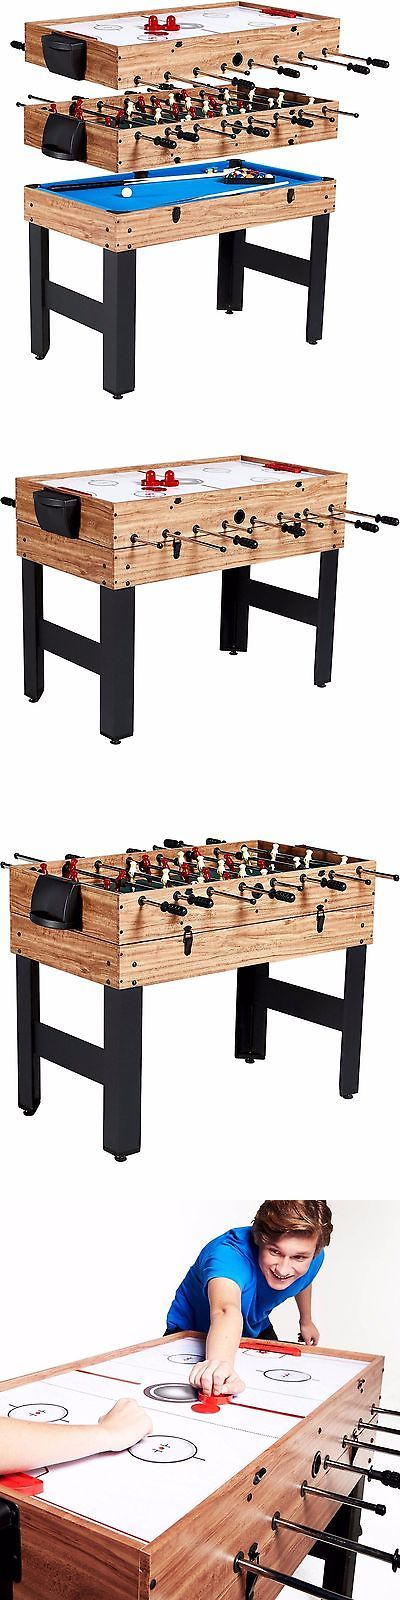 Foosball 36276: Multi Game Table Combo 3 In 1 Pool Billiards Air Hockey Foosball Soccer Convert -> BUY IT NOW ONLY: $120.87 on eBay!